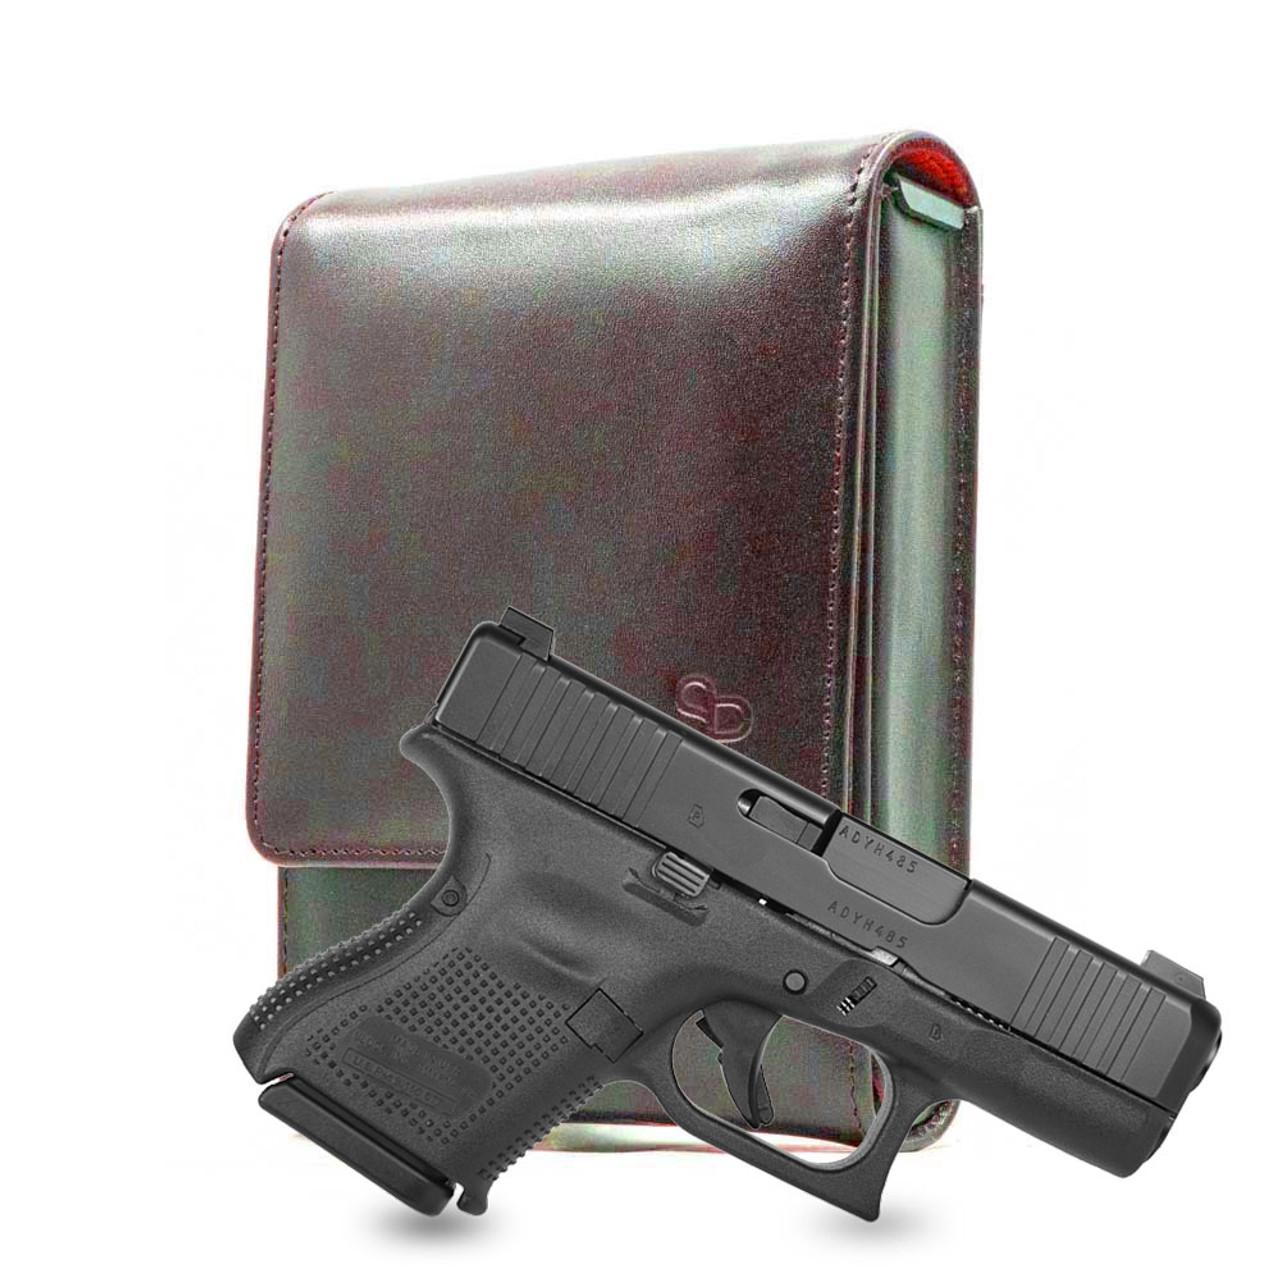 Glock 26 Brown Leather Series Holster